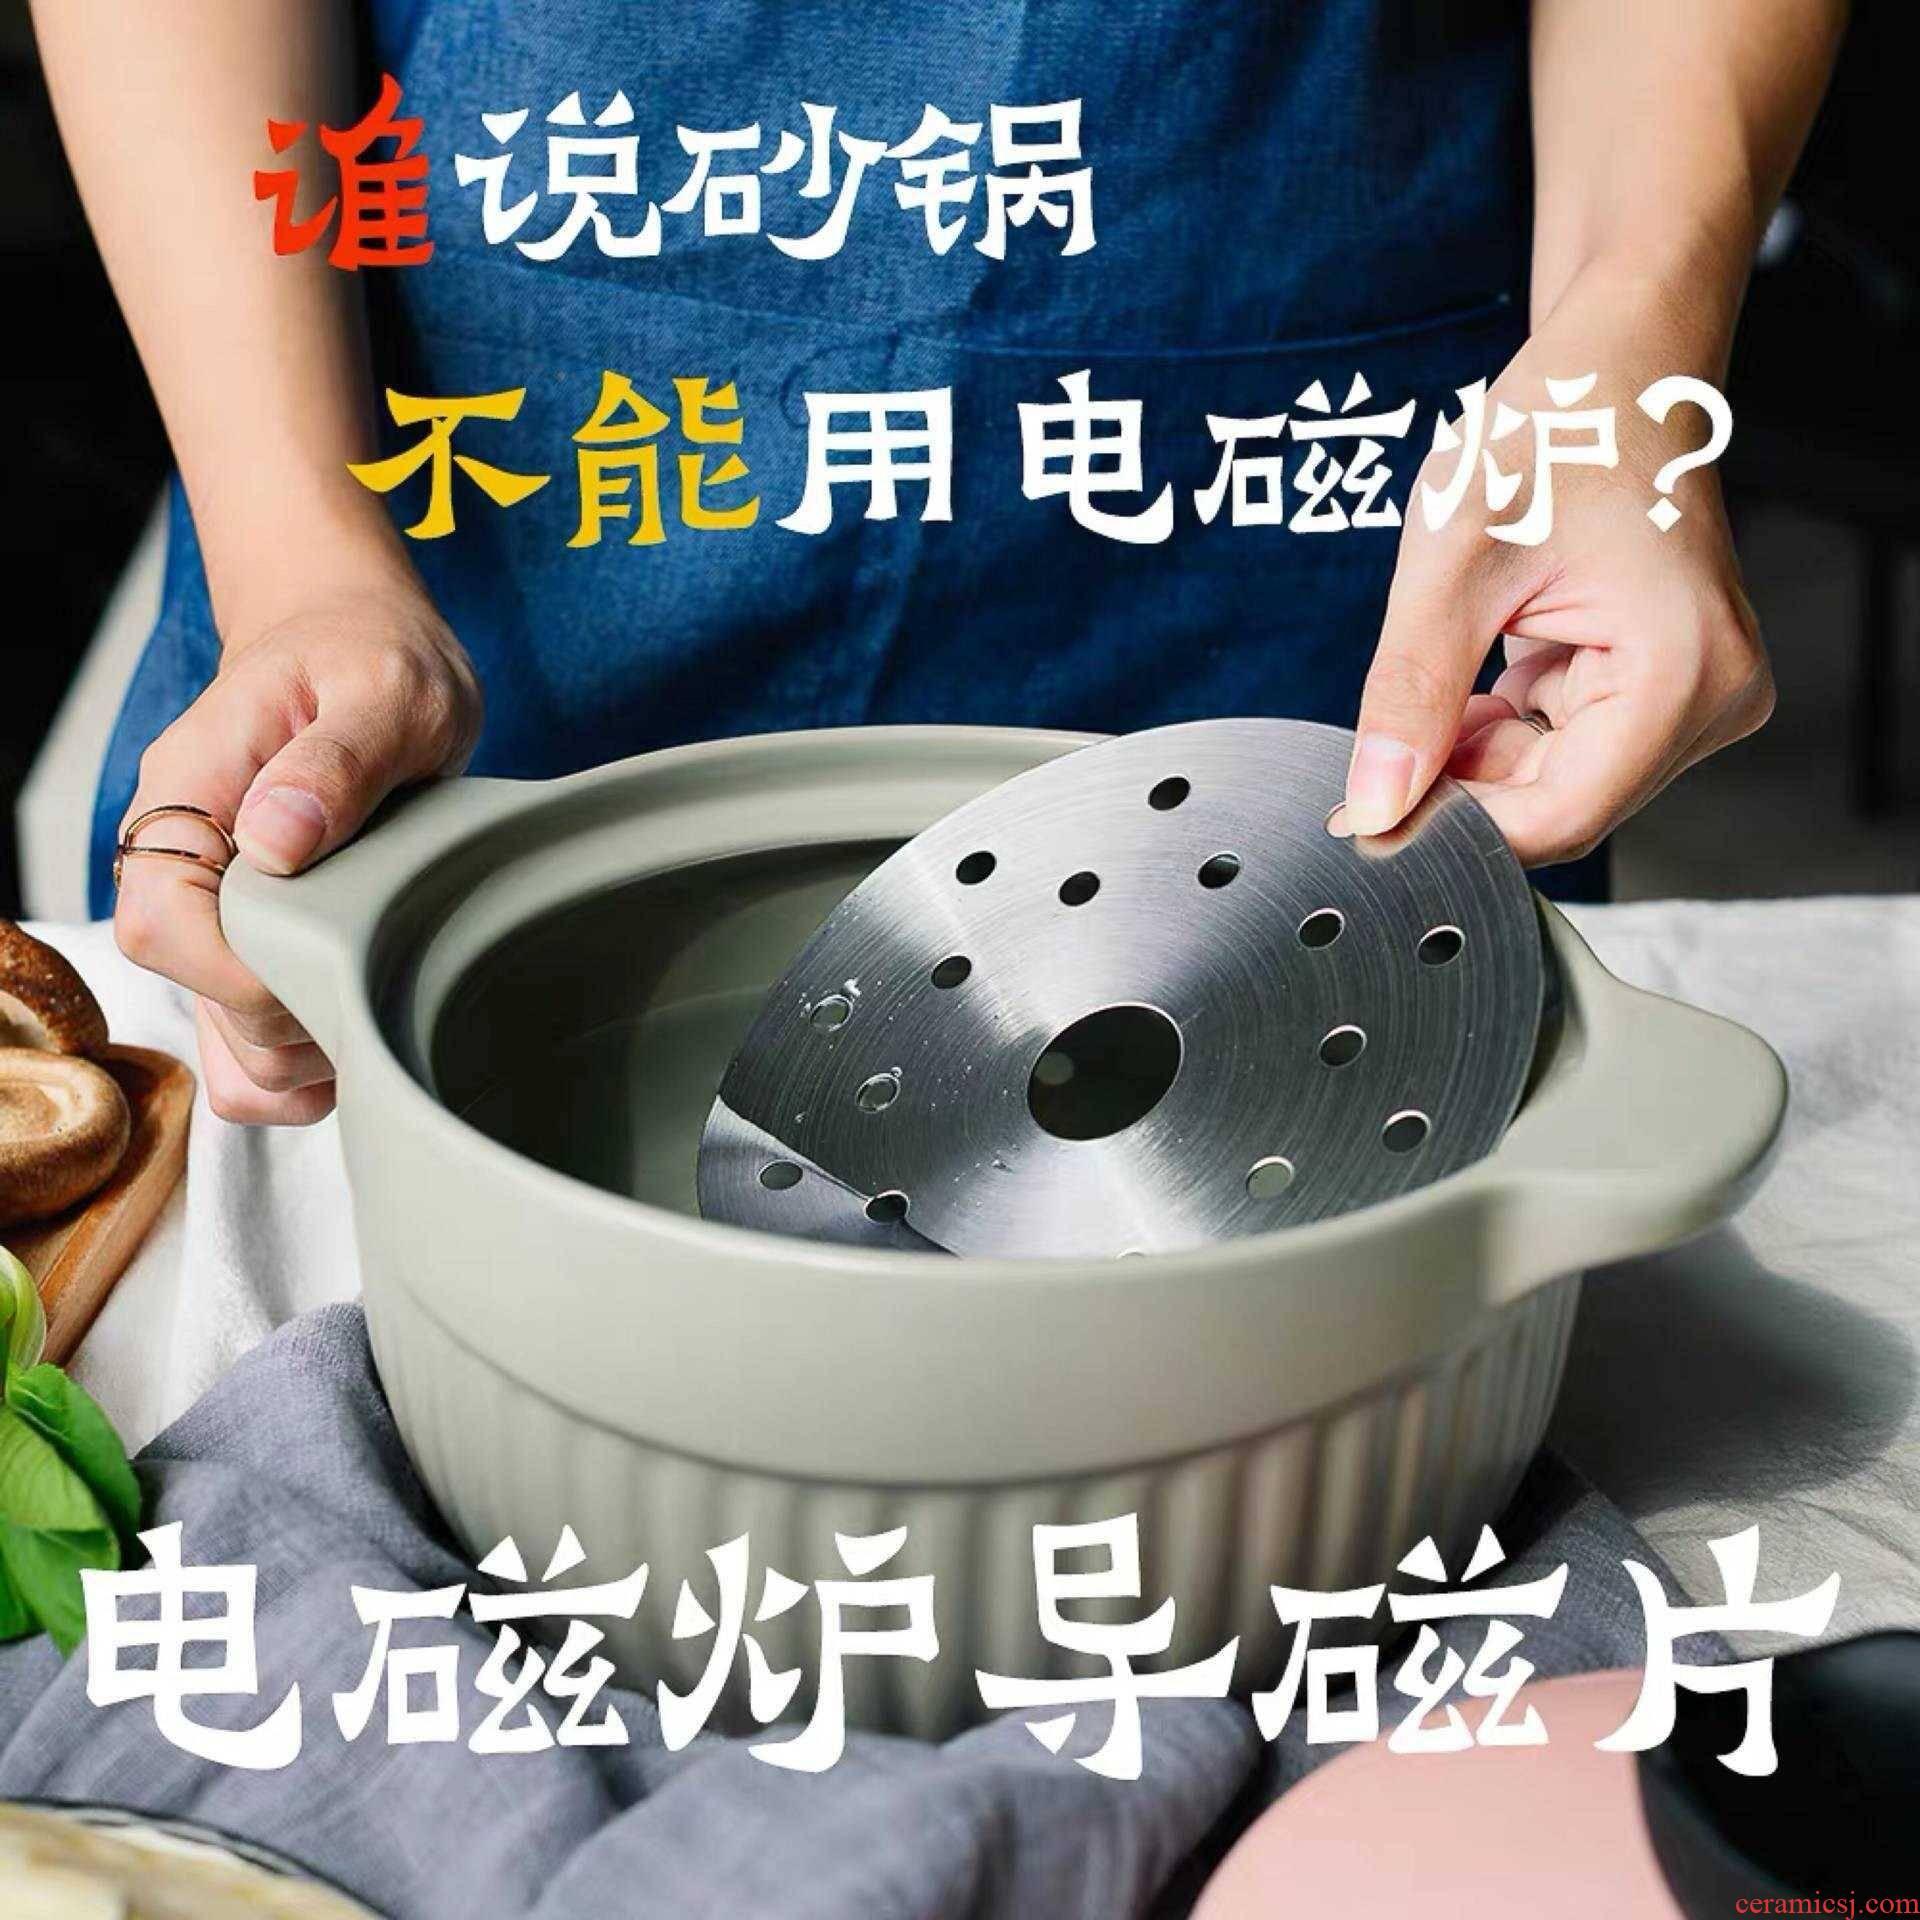 Sand earthenware pot induction cooker plate packages mailed induction cooker pot magnetic conductivity pills glass ceramic pot stew pot does not rust